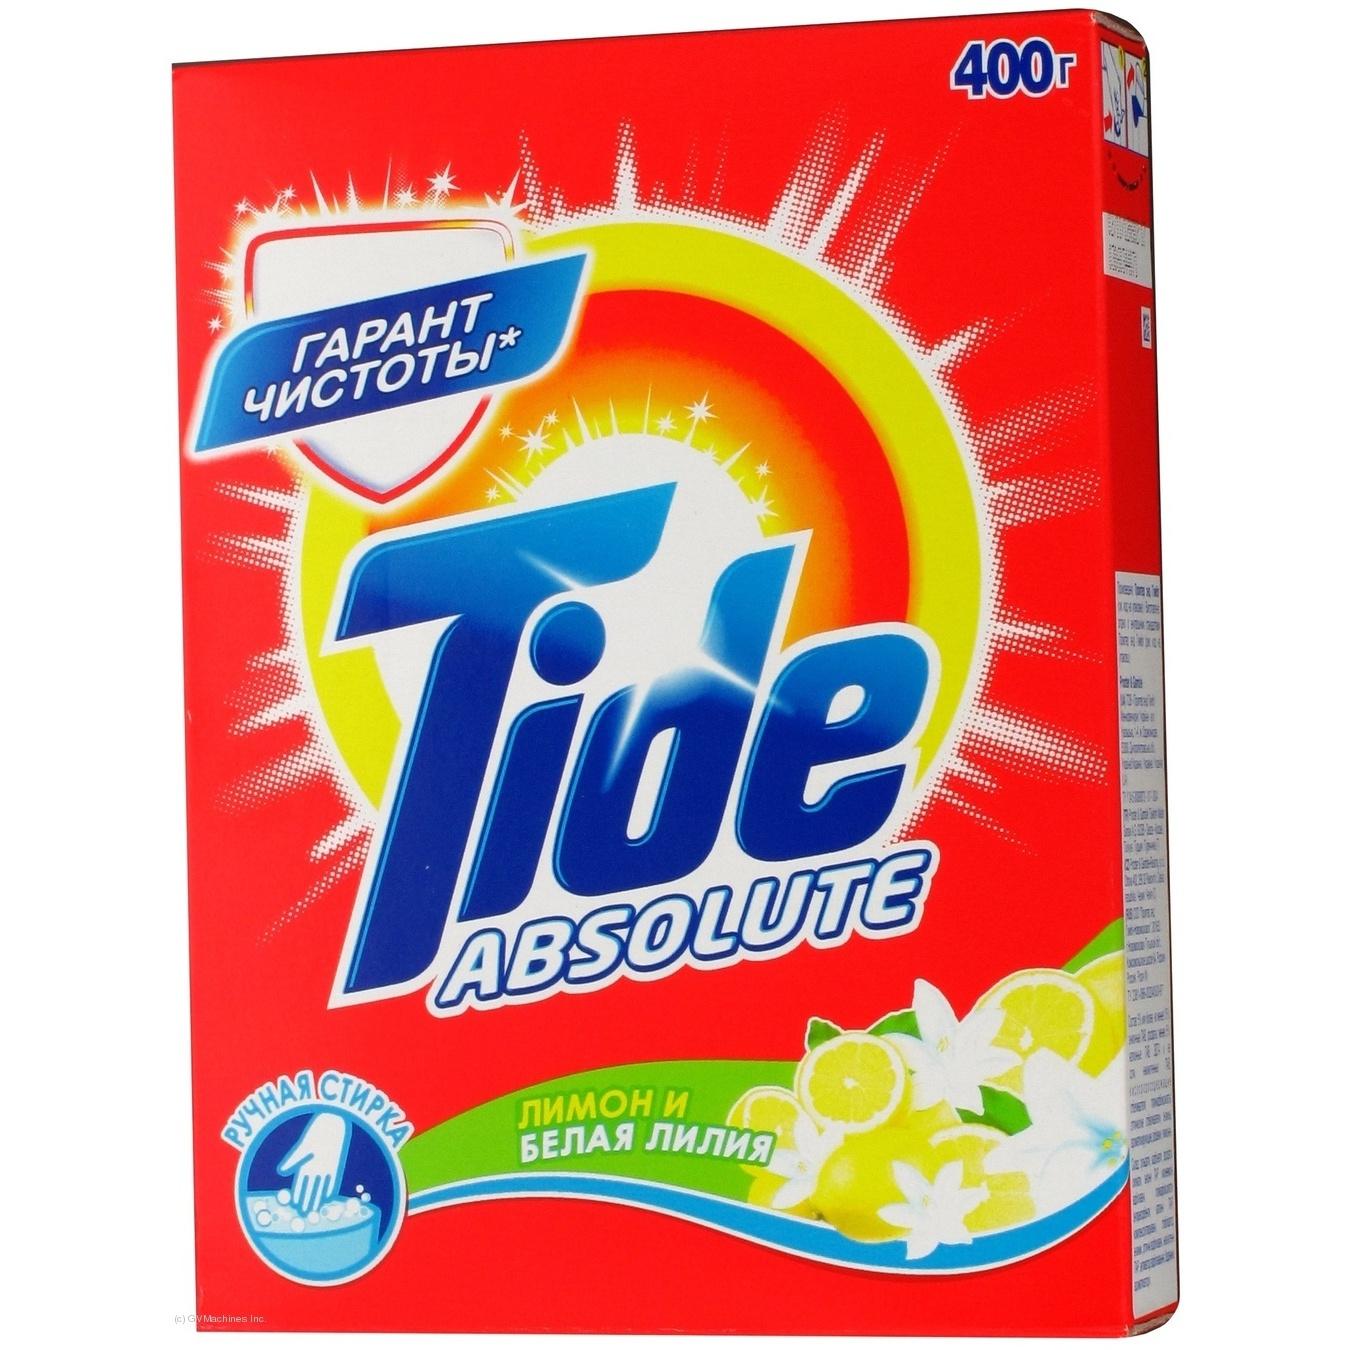 powder detergent tide for washing 400g � household